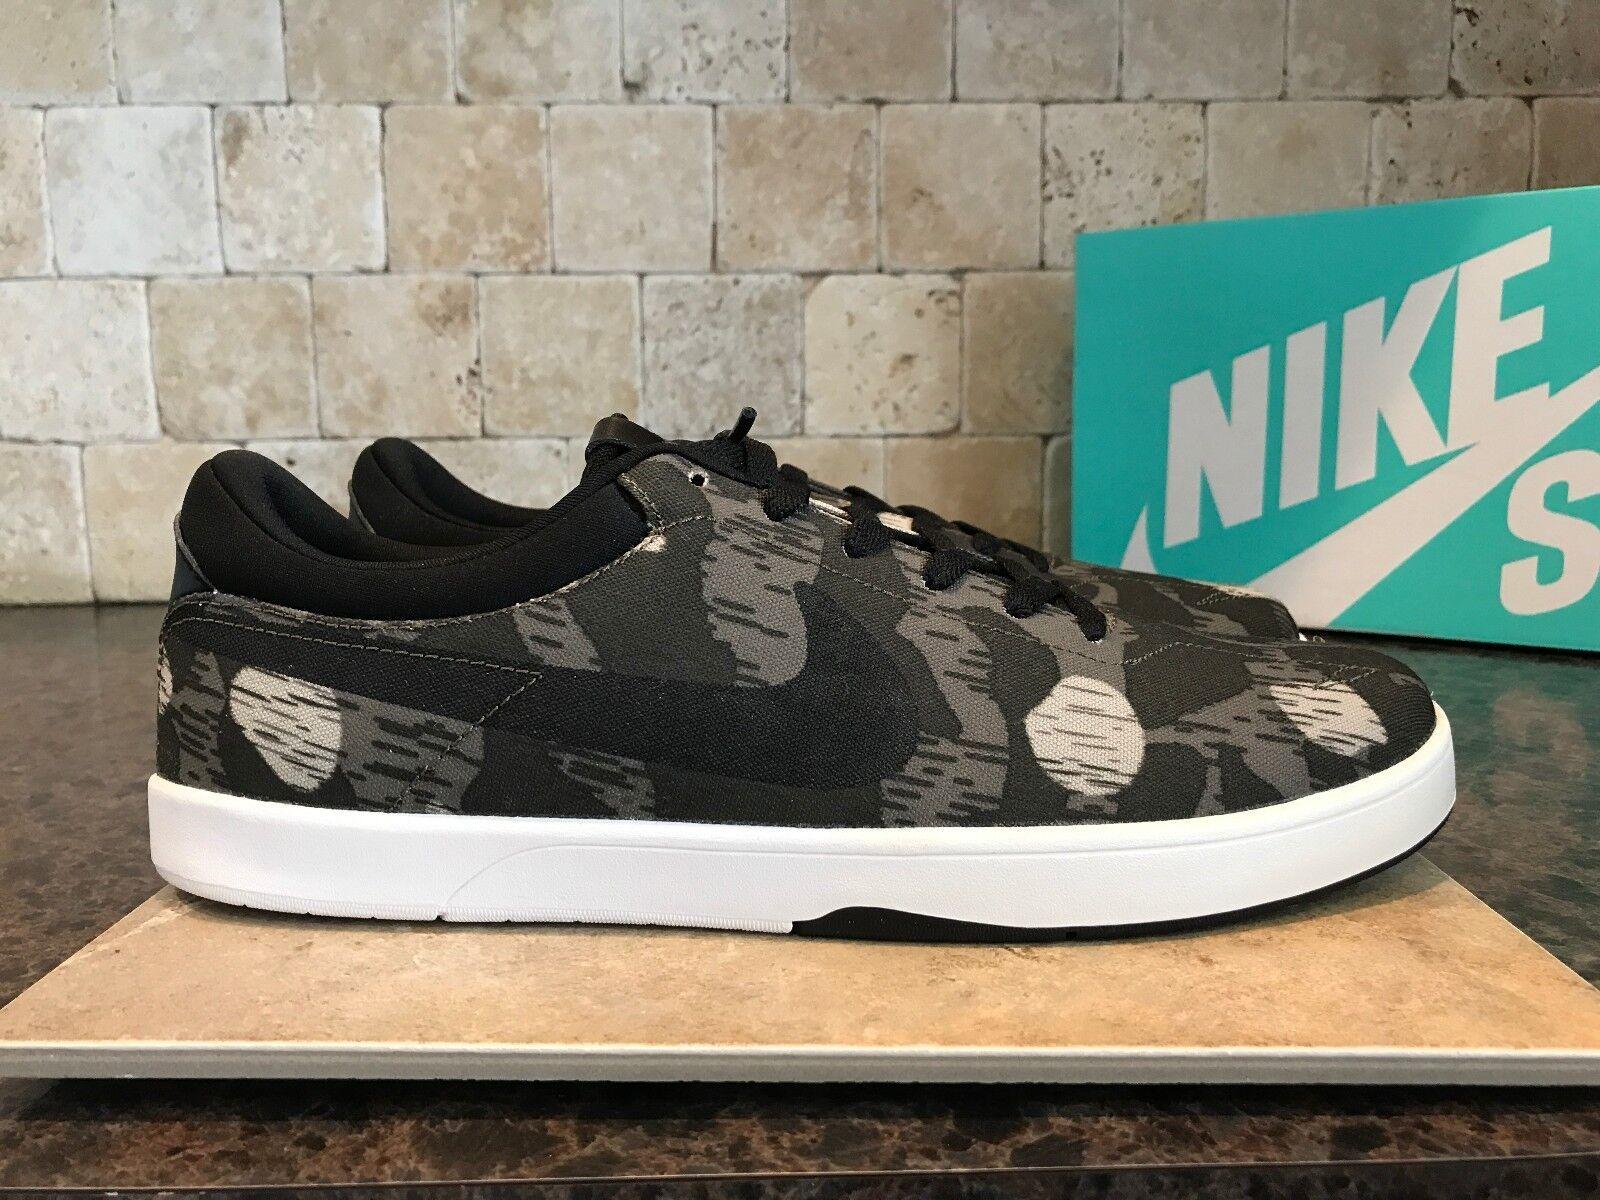 Nike Eric Koston SE low Uomo casual SB scarpe da ginnastica Camo dark dune red SIZE 11.5